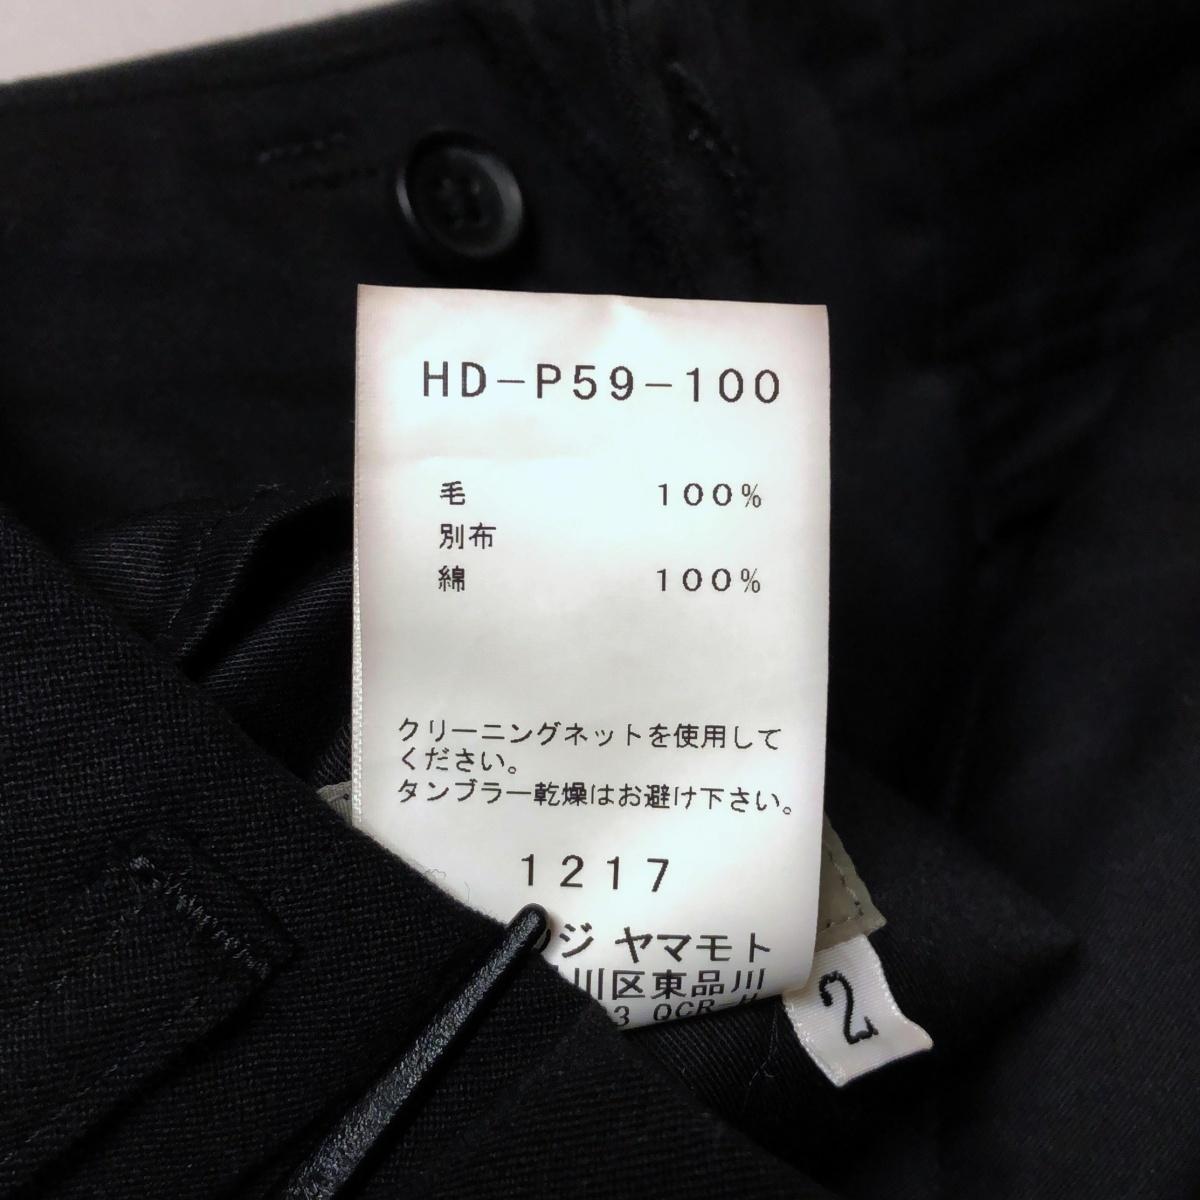 17SS YOHJI YAMAMOTO POUR HOMME ヨウジヤマモトプールオム ラップパンツ シワギャバ ウールギャバ ハーフパンツ H-右前垂らし布Pギャバ_画像9